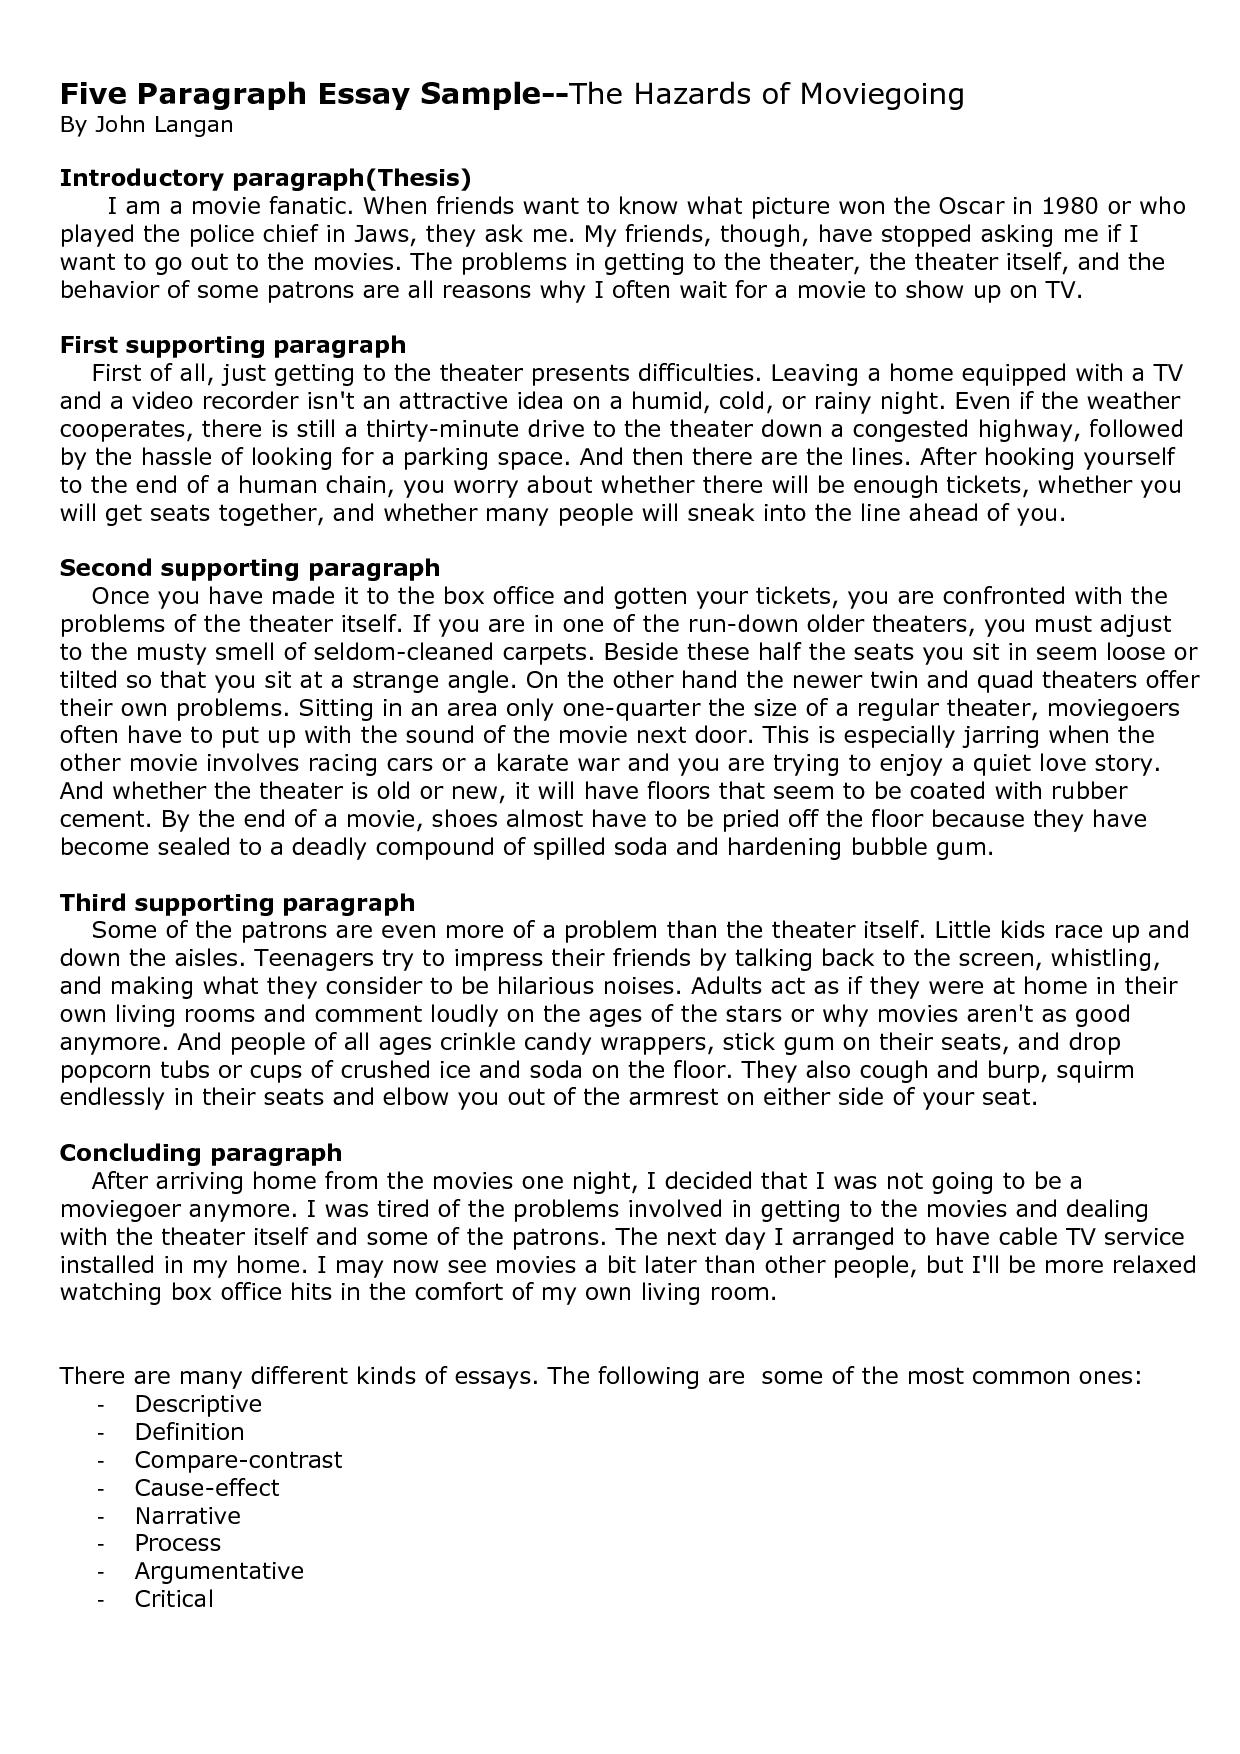 001 U2shuebtjf Essay Example Sample Stupendous 5 Paragraph Camping Pdf For 4th Grade Full